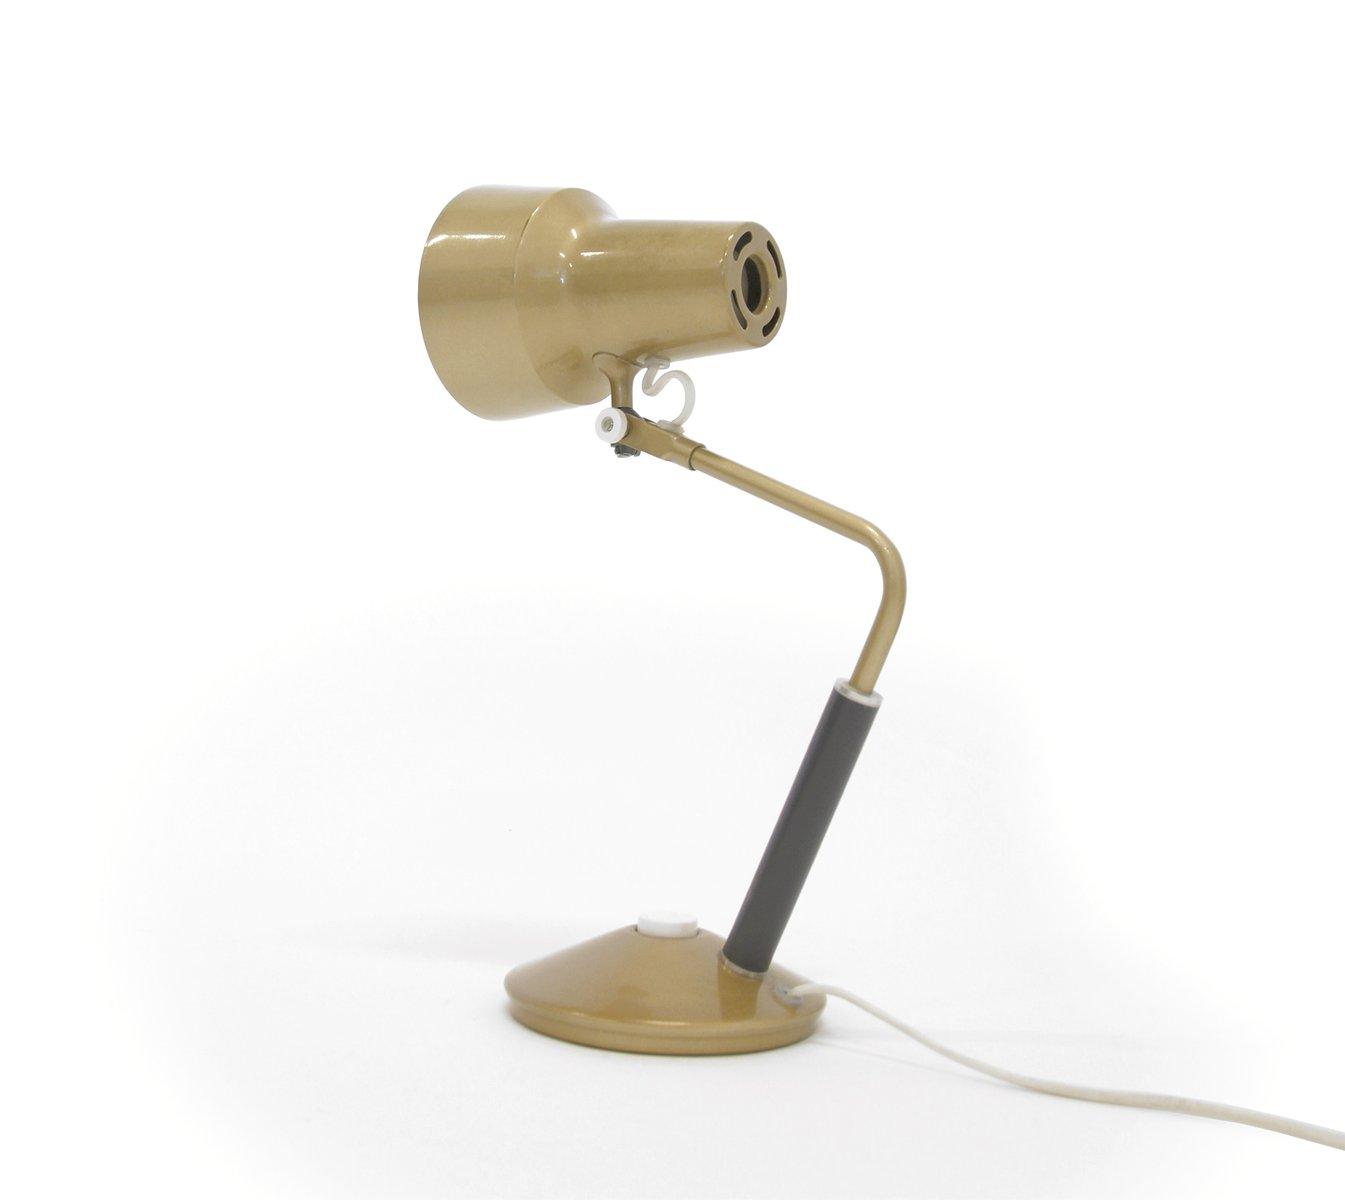 norwegian luxo l table lamps from jac jacobsen s set of   - price per set